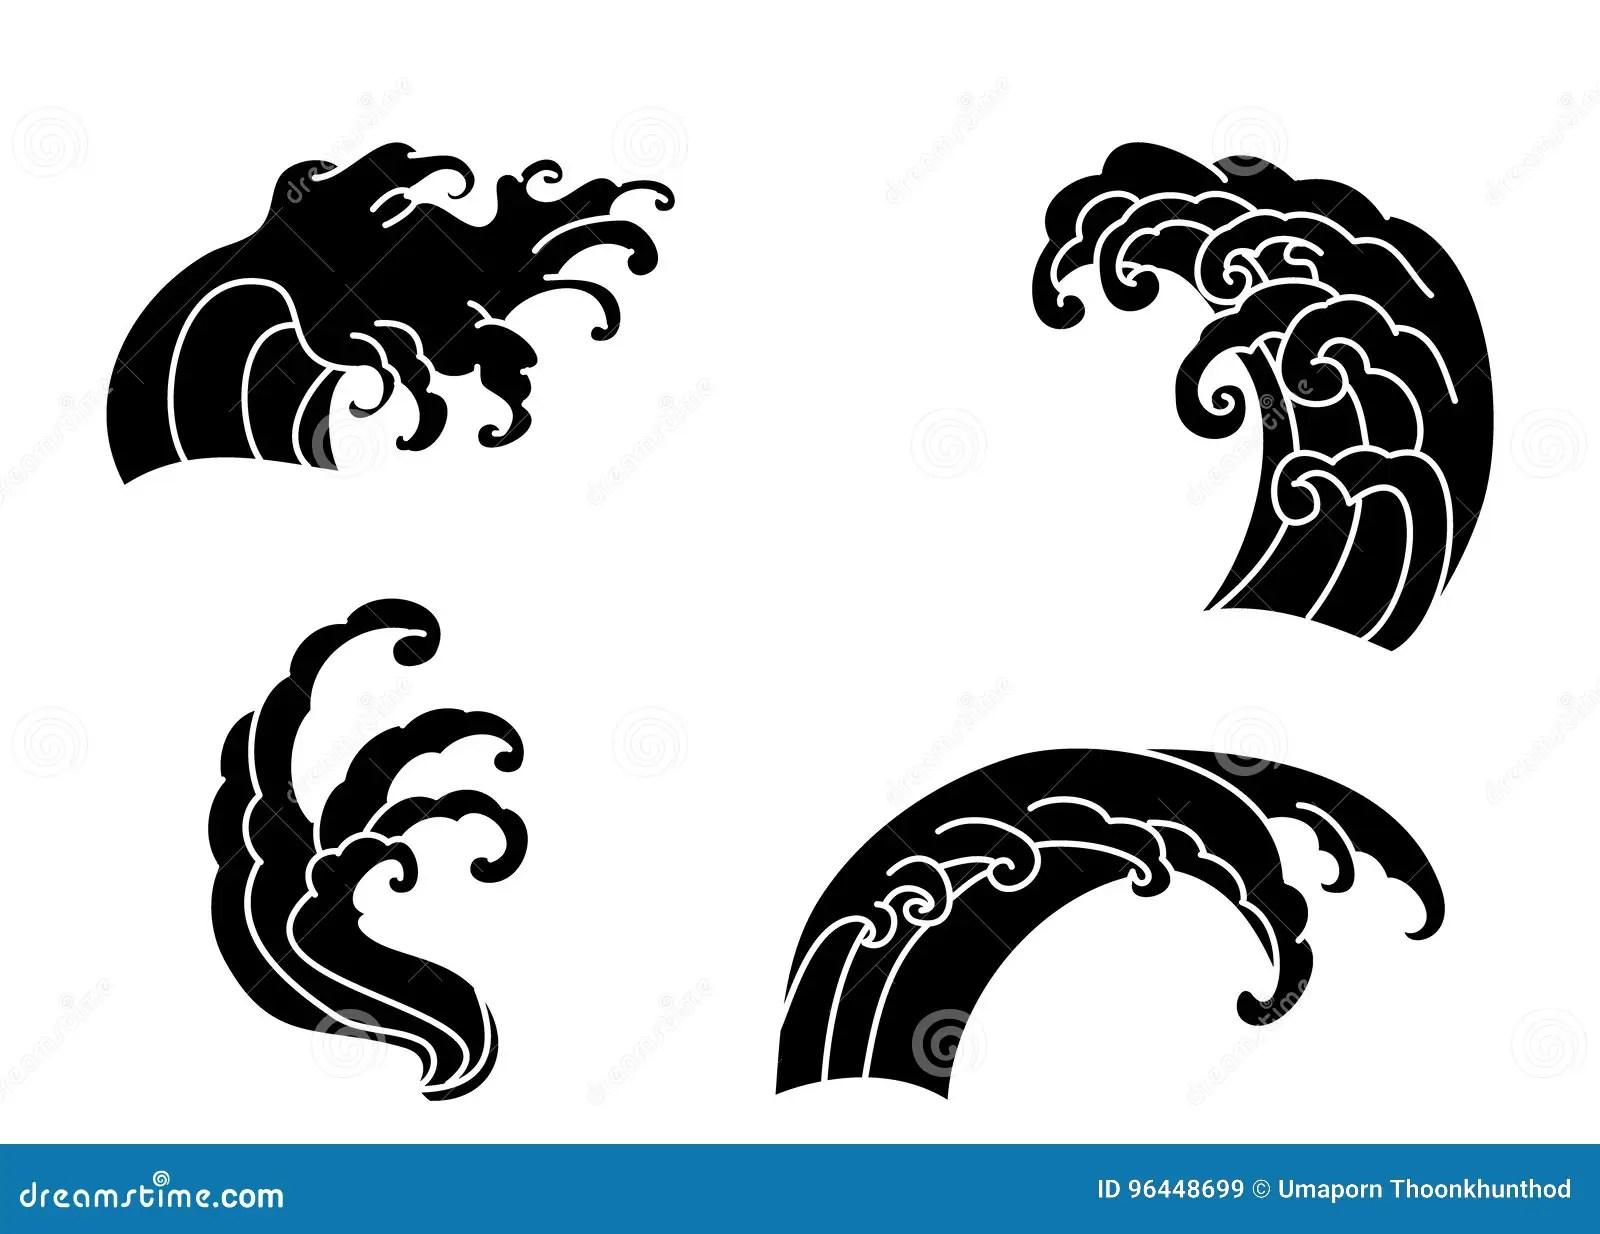 Wave Tattoo Design Isolate Vector Stock Vector